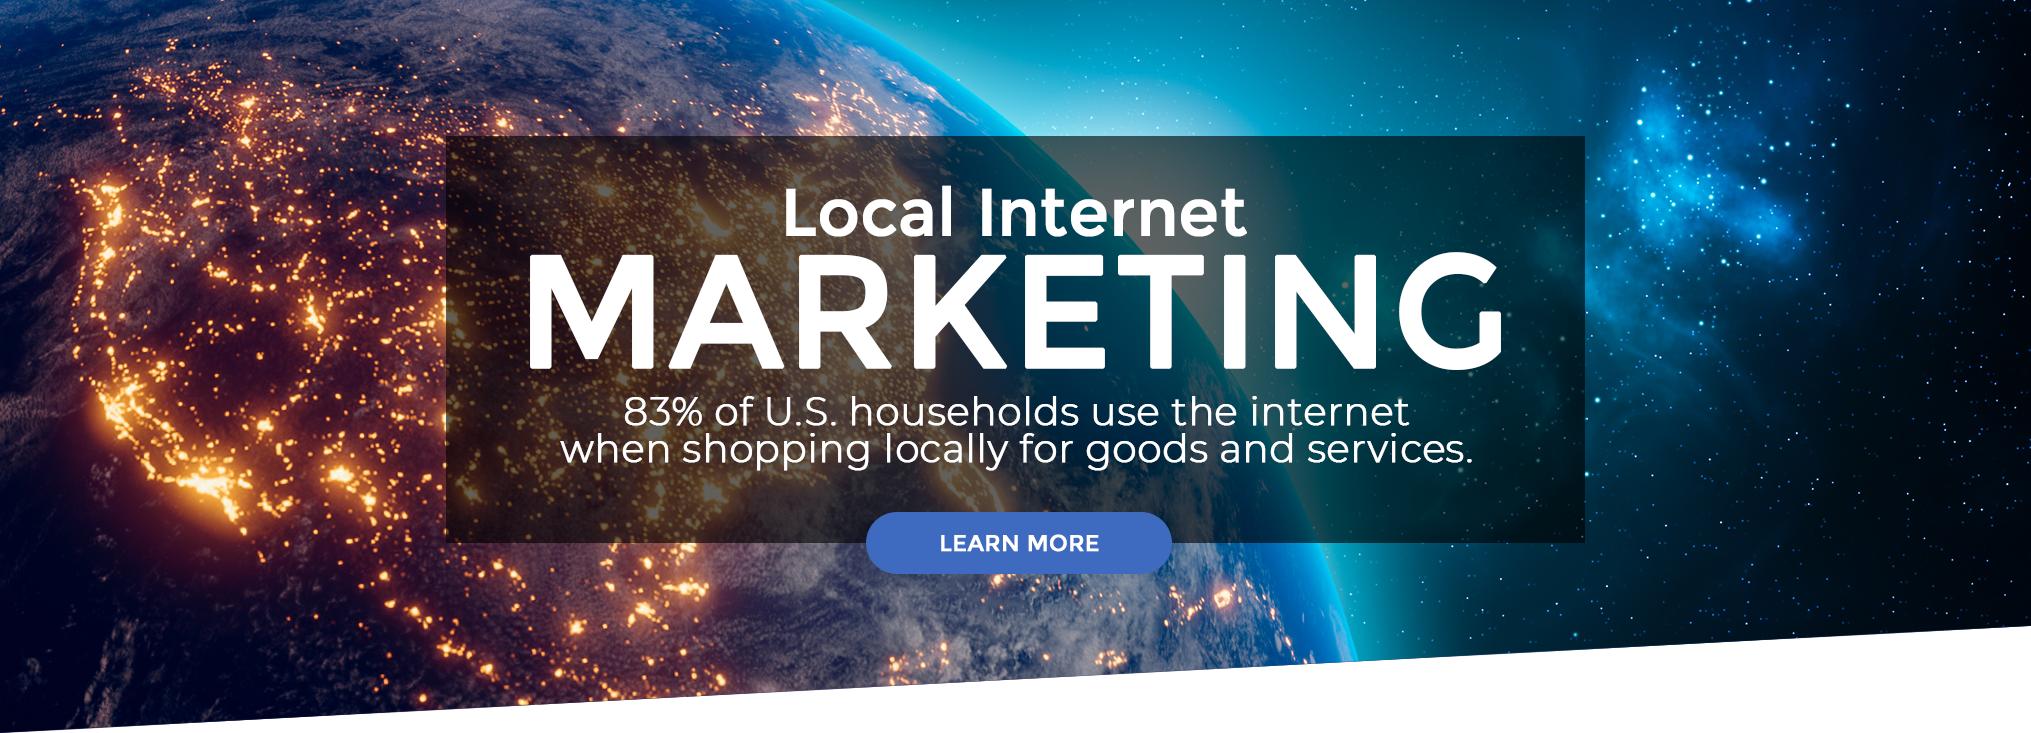 local internet marketing service near me huntersville cornelius nc